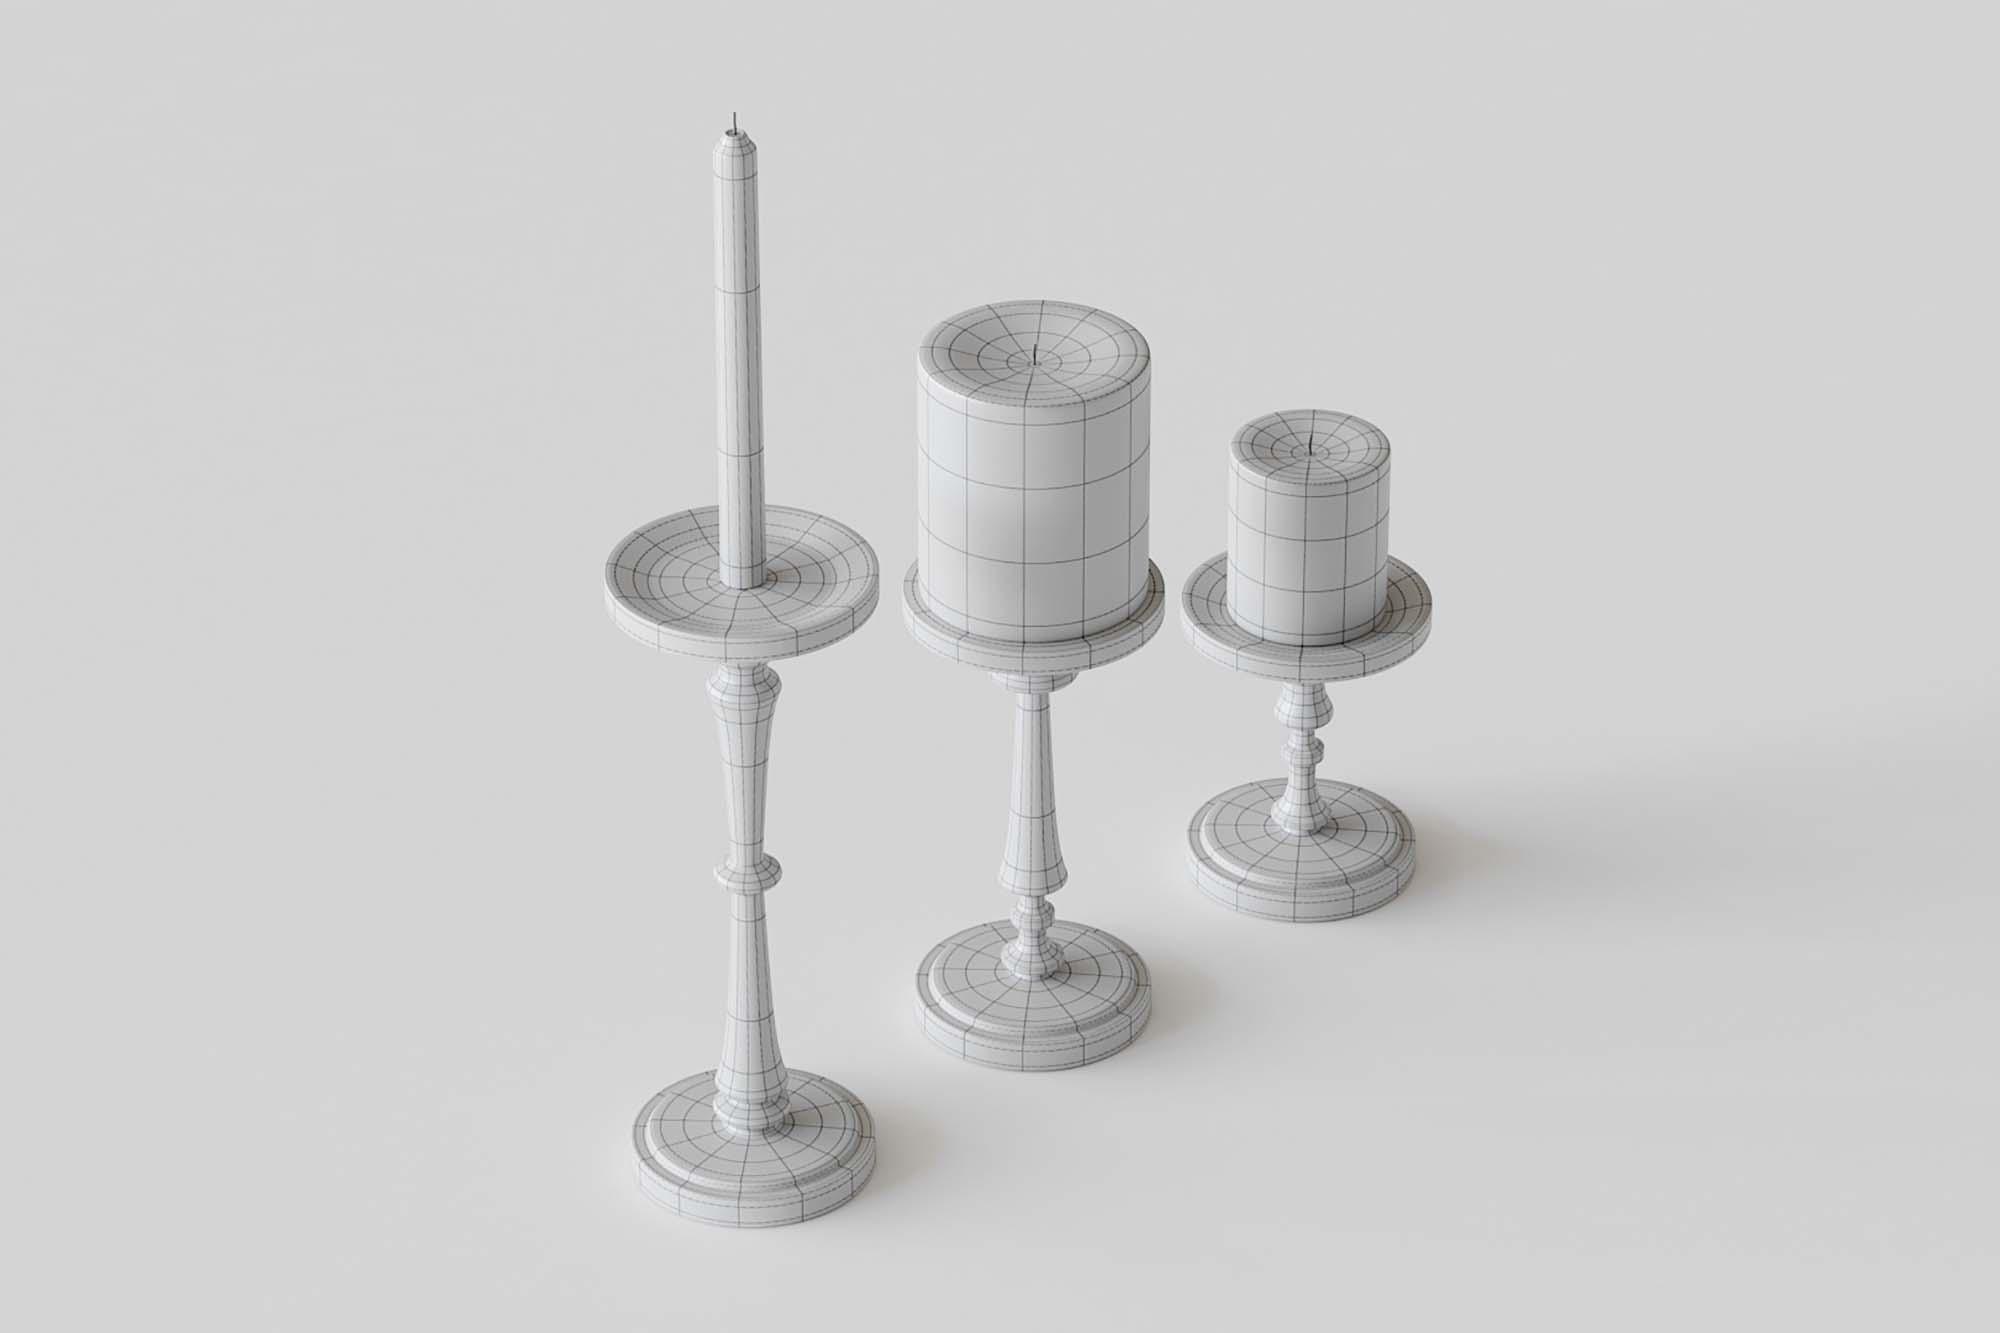 Candlesticks 3D Models 2